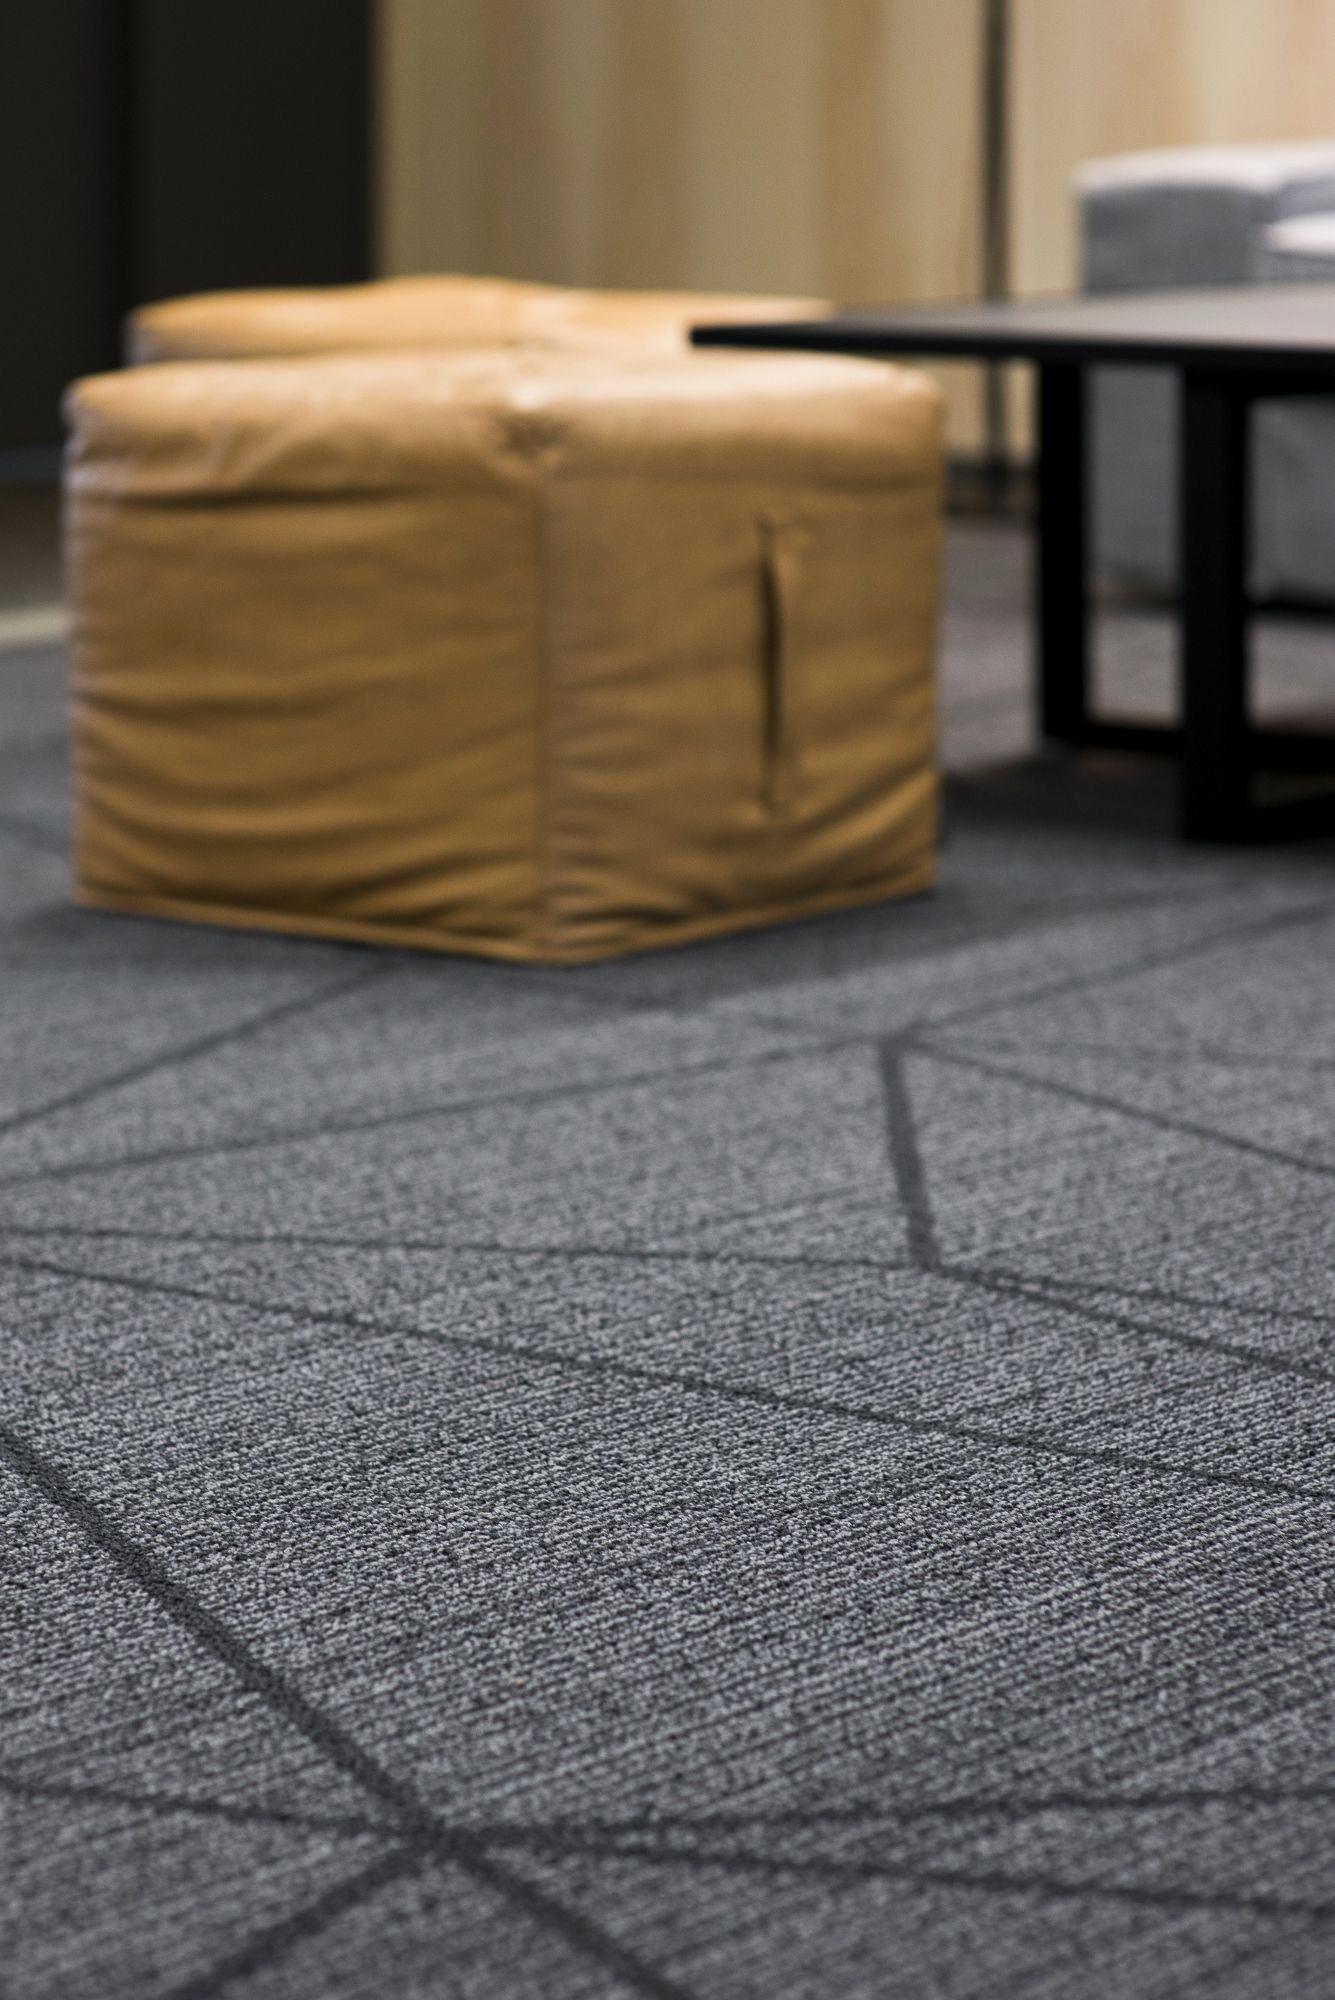 Best Way To Clean Carpet Runners Carpetrunnersbythemetre In